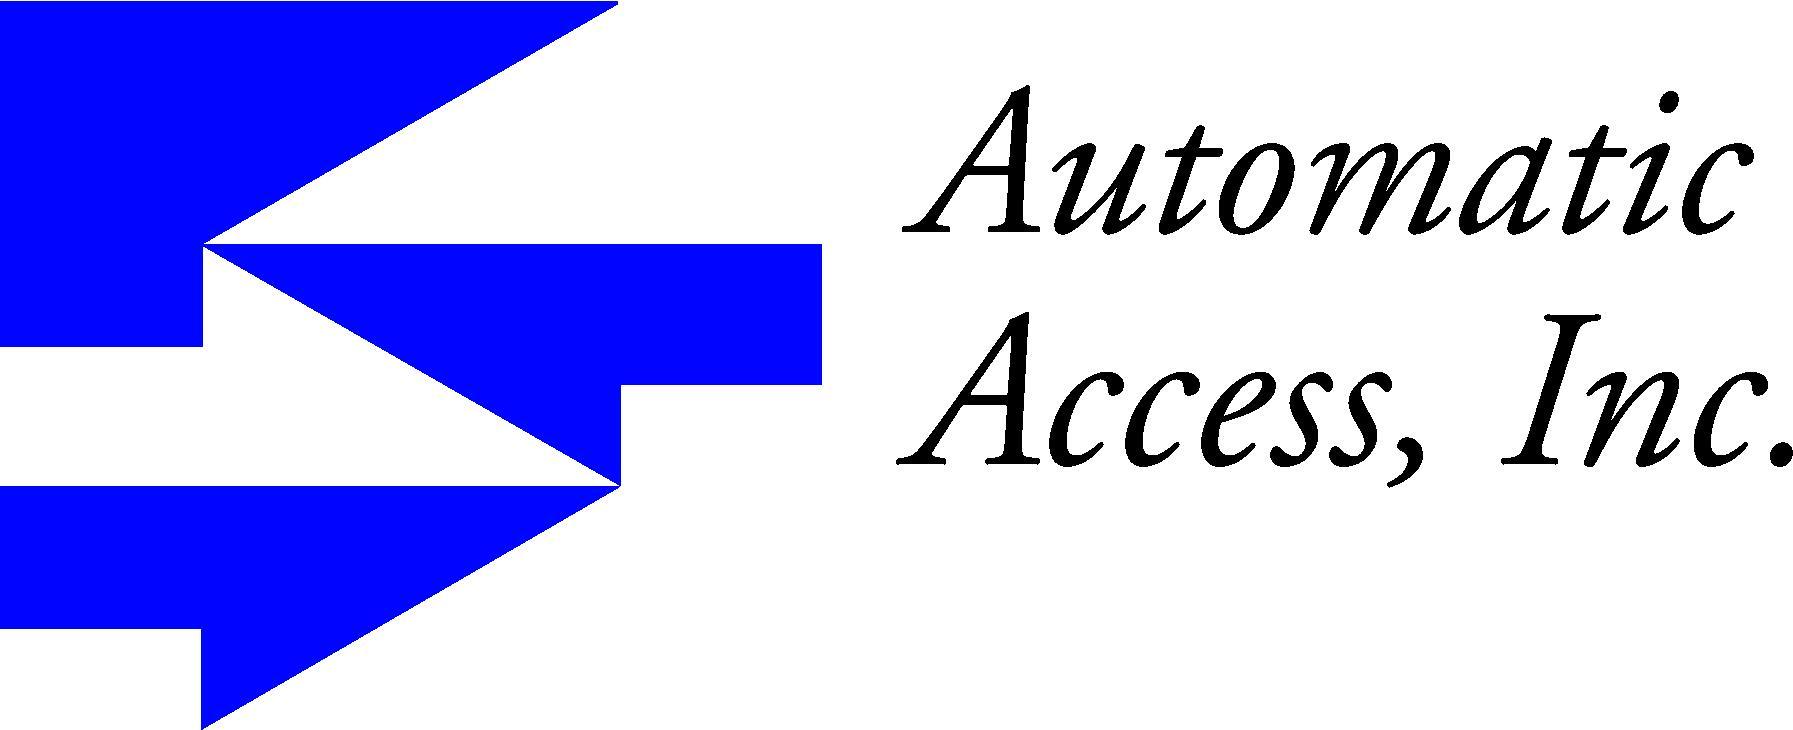 Automatic Access Inc